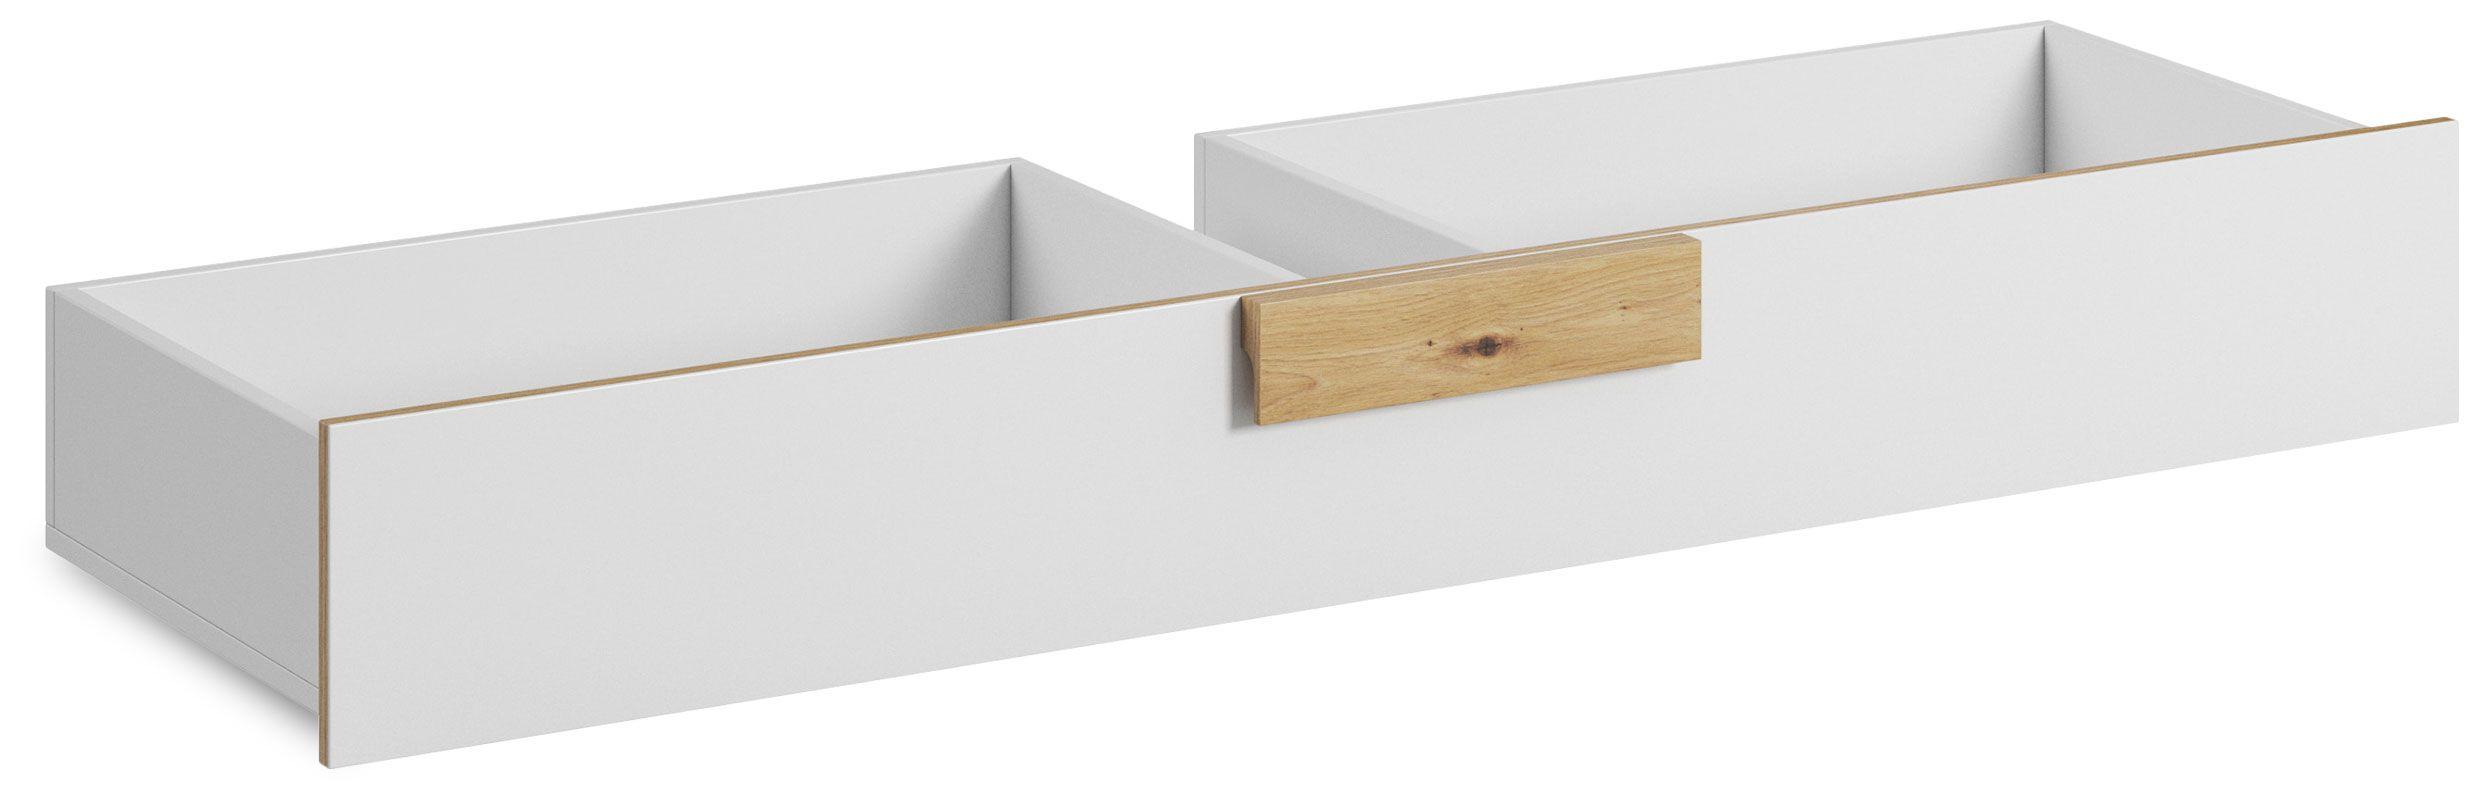 szuflada imoss lbll01  1